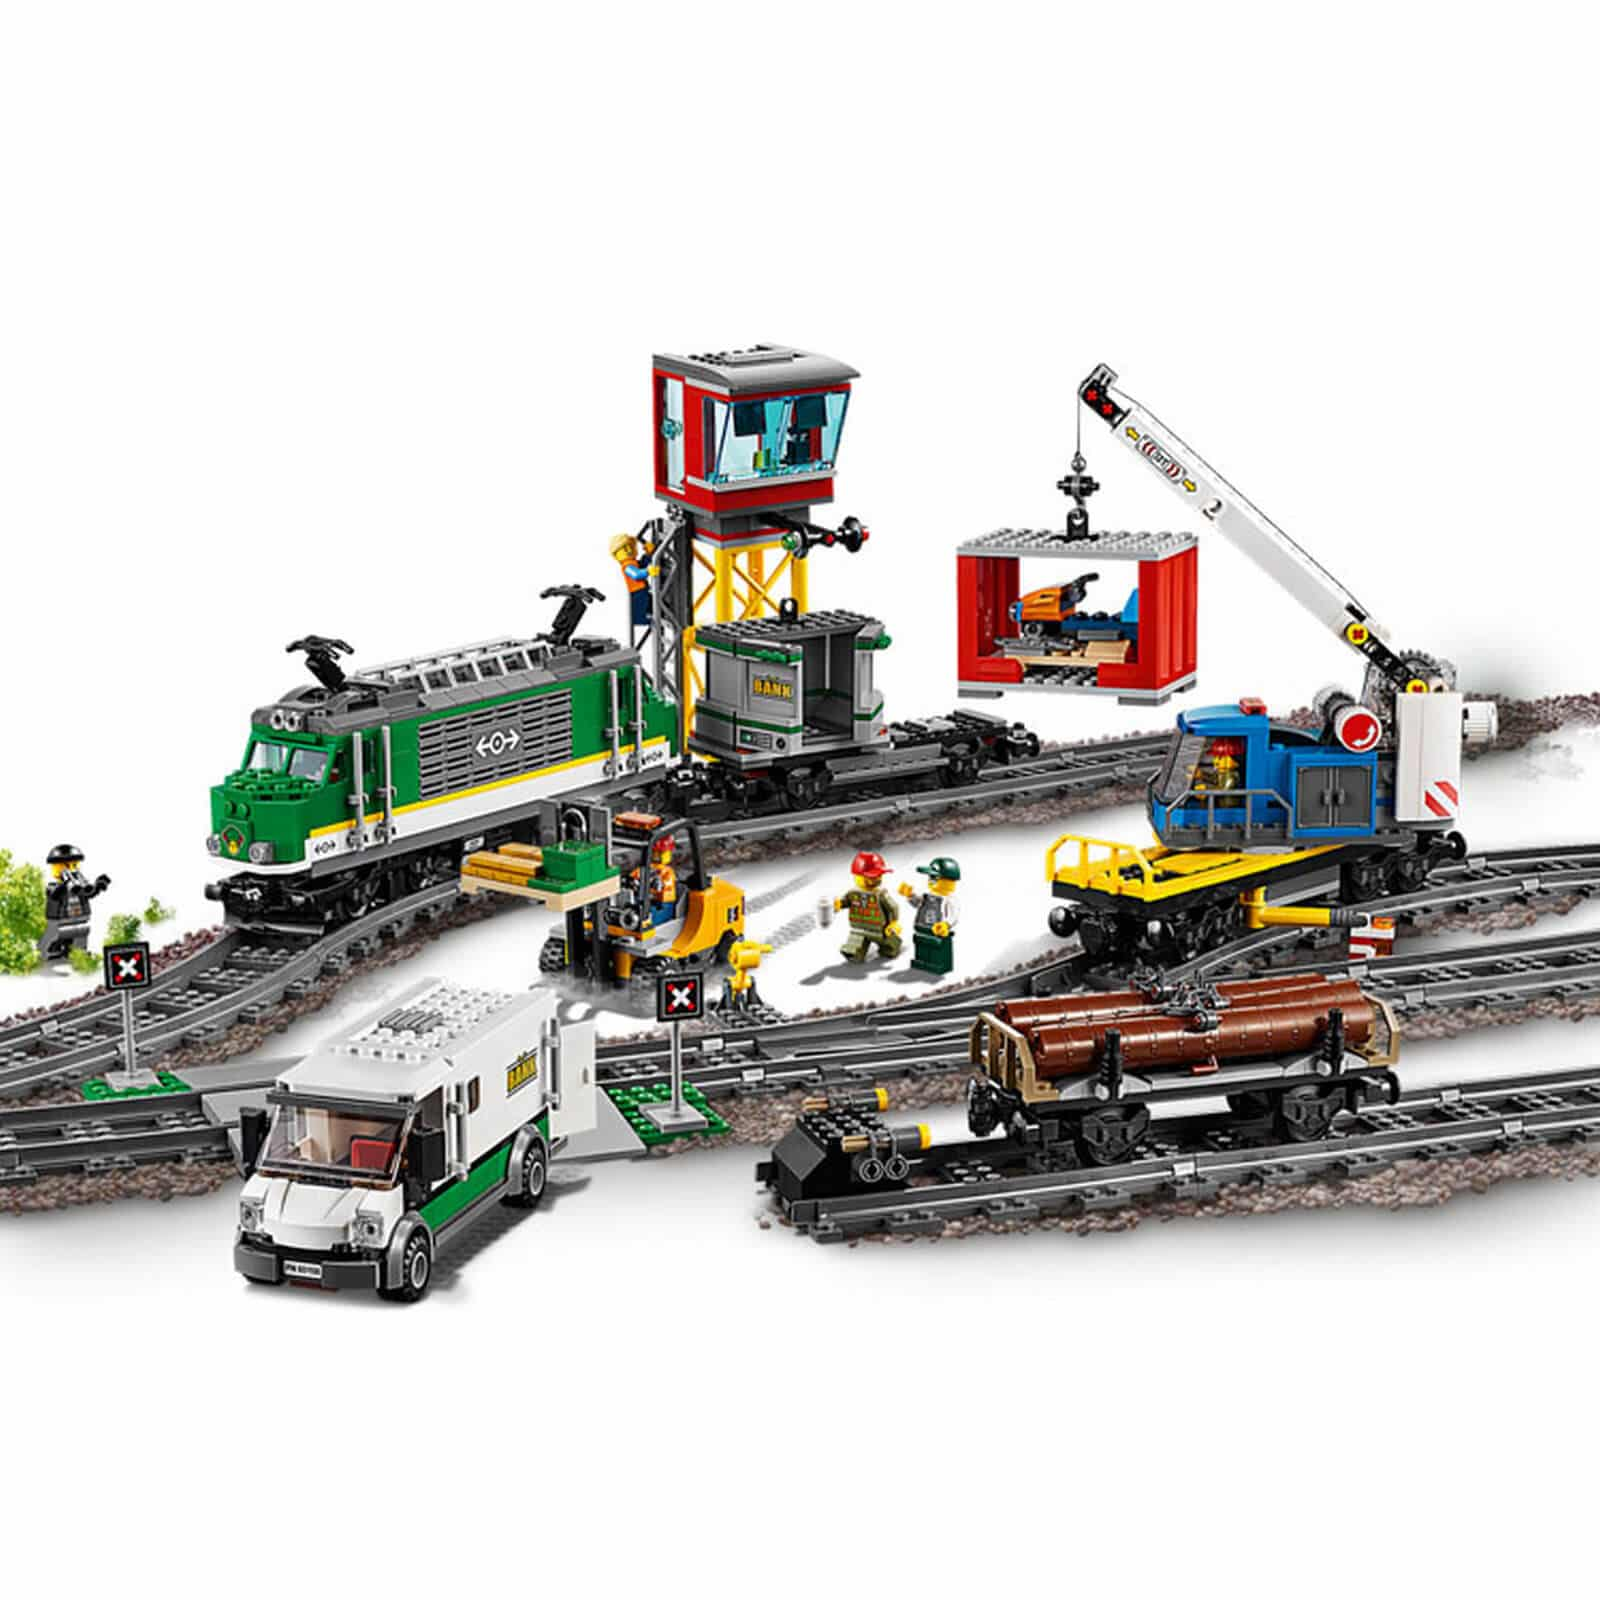 LEGO® 60198 City Cargo Train - Jadrem Toys